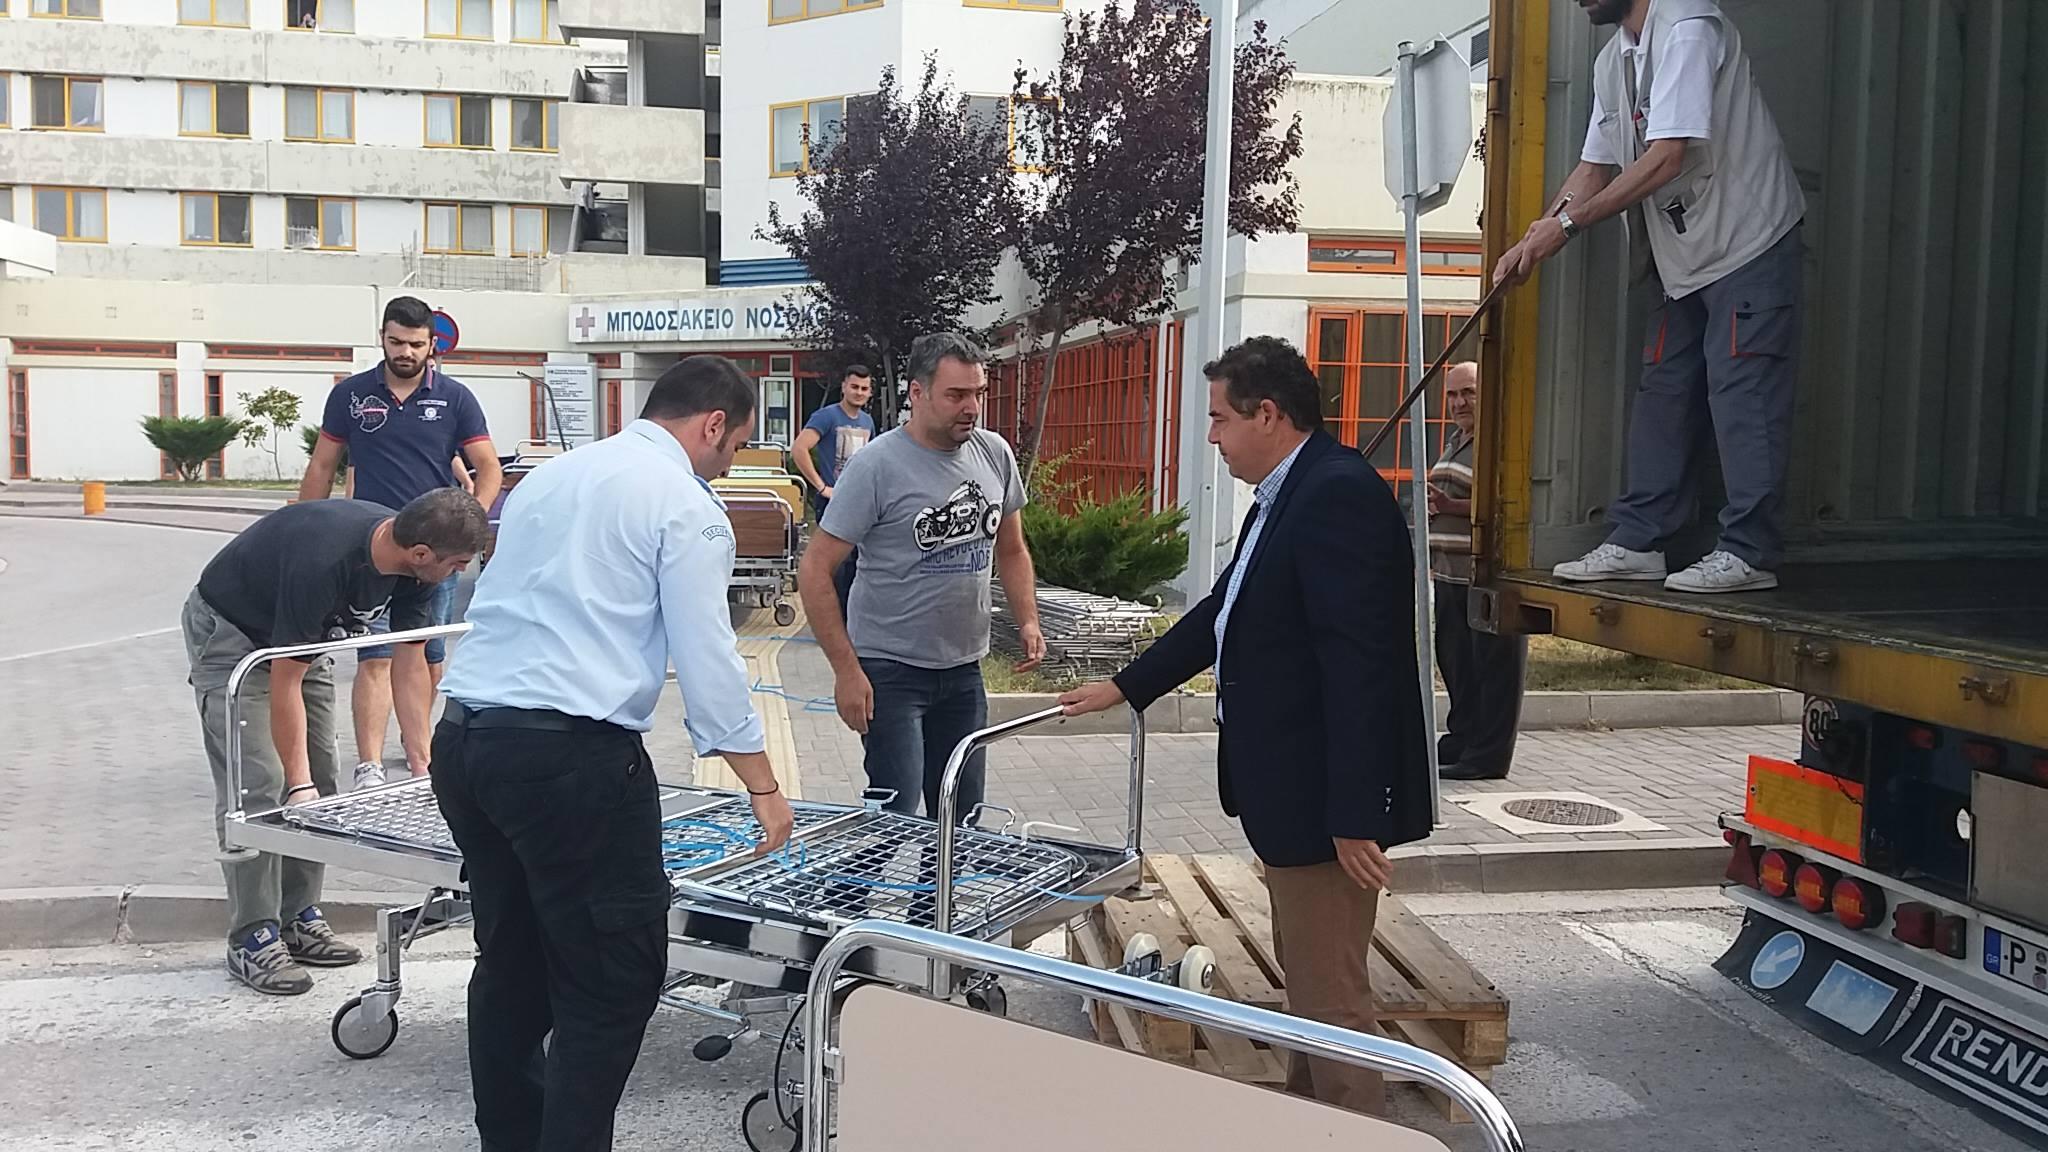 kozan.gr: Έφτασαν, σήμερα (Παρασκευή), το πρωί, από την Αυστρία, οι πρώτες 60 κλίνες για το Μποδοσάκειο Νοσοκομείο